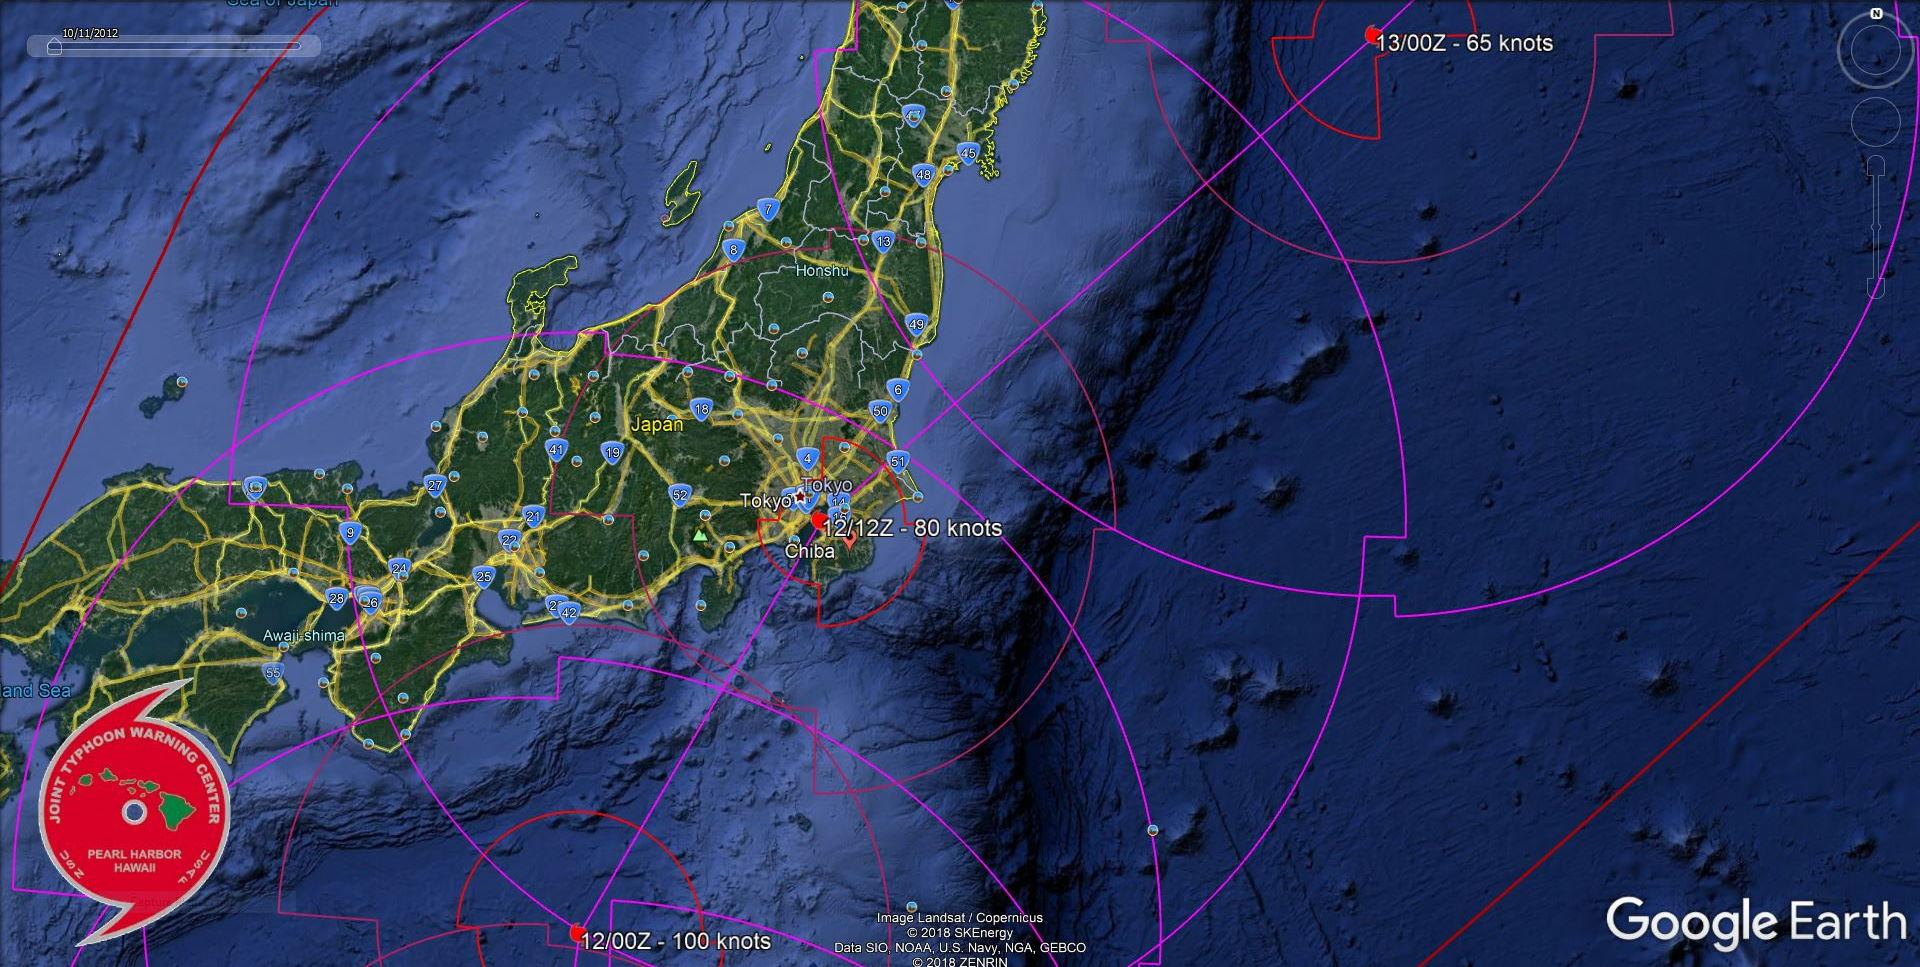 Typhoon Hagibis(20W) is bearing down on the Tokyo/Chiba area